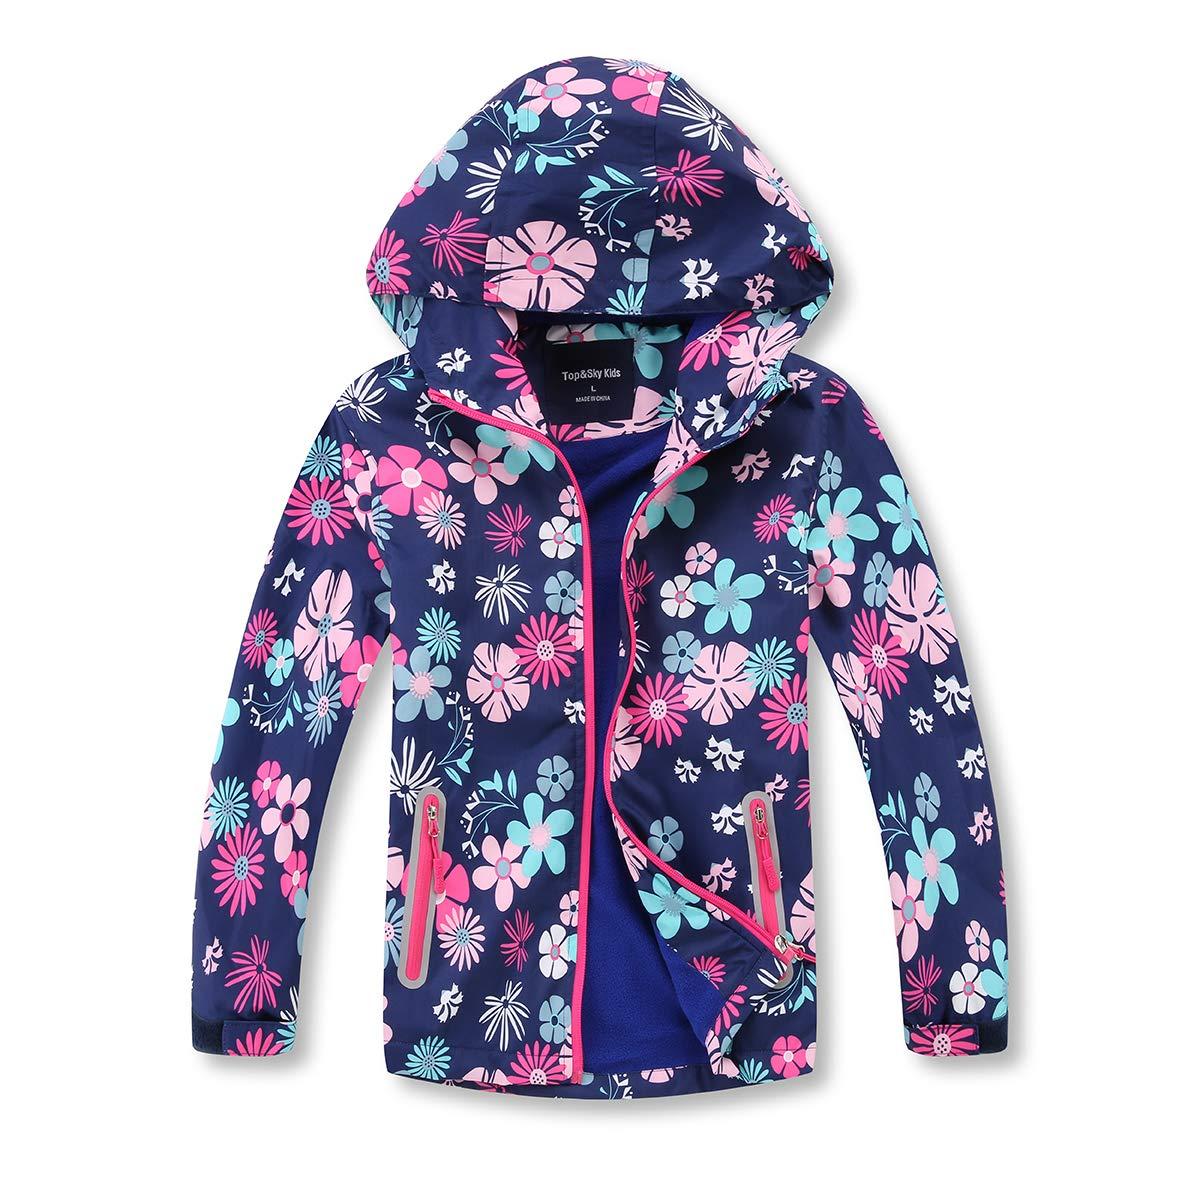 MGEOY Boys Girls Rain Jackets Lightweight Waterproof Hooded Raincoats Windbreakers for Kids